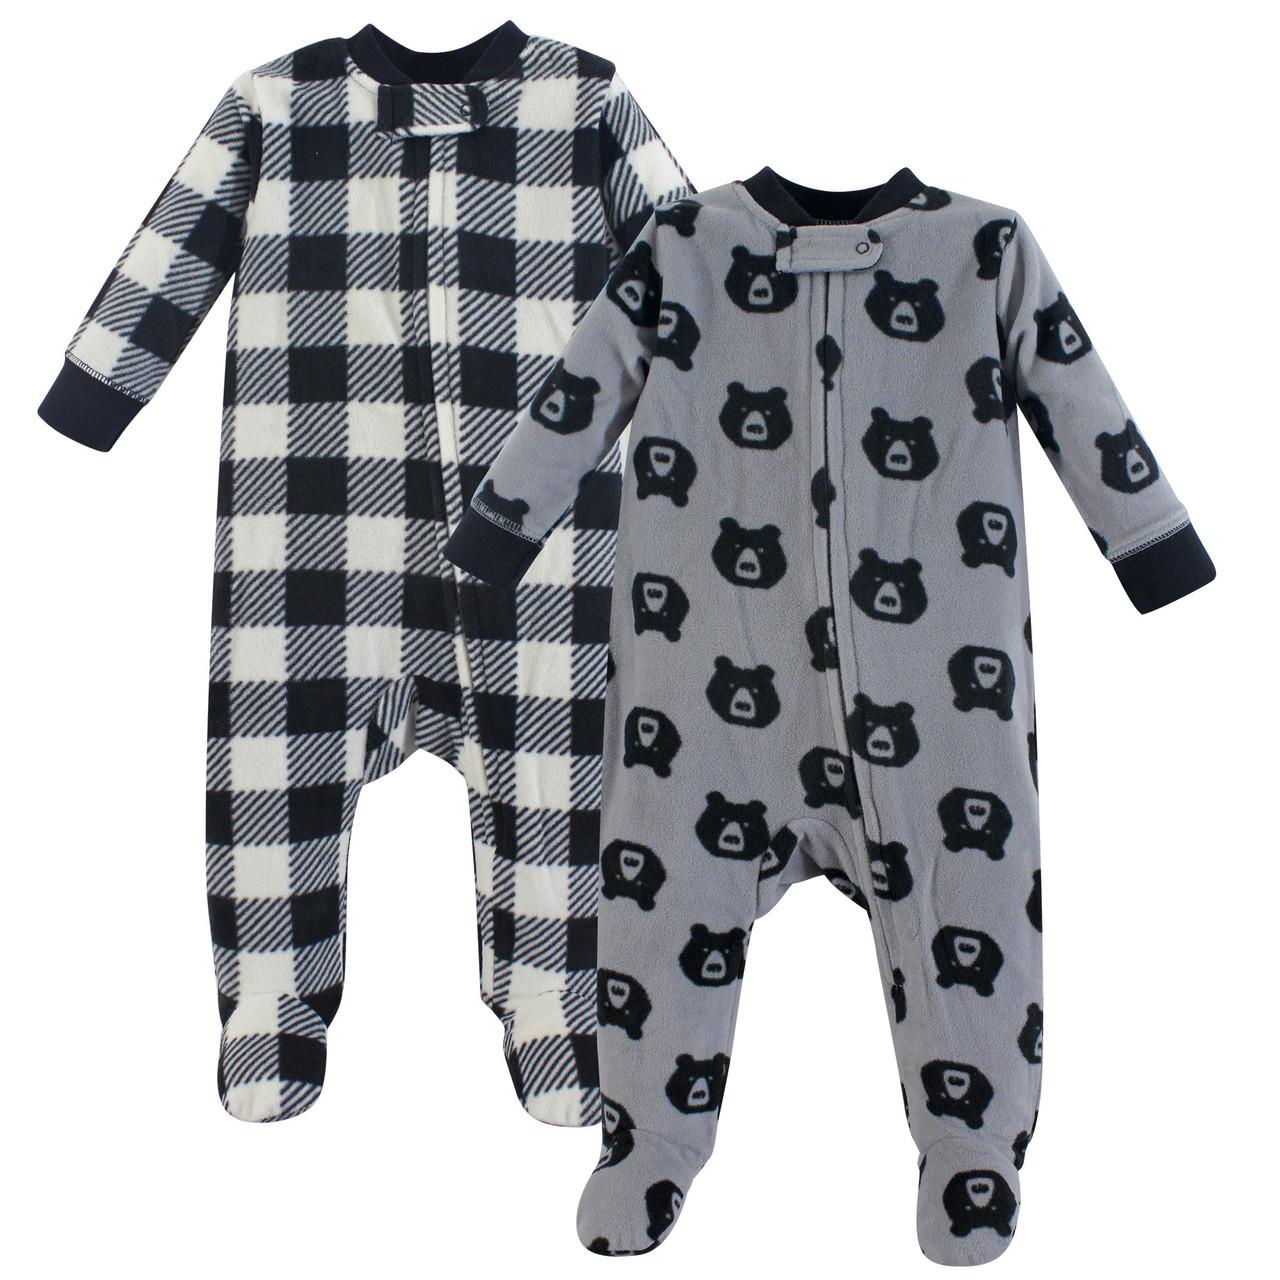 Essentials Baby 2-Pack Microfleece Sleep and Play